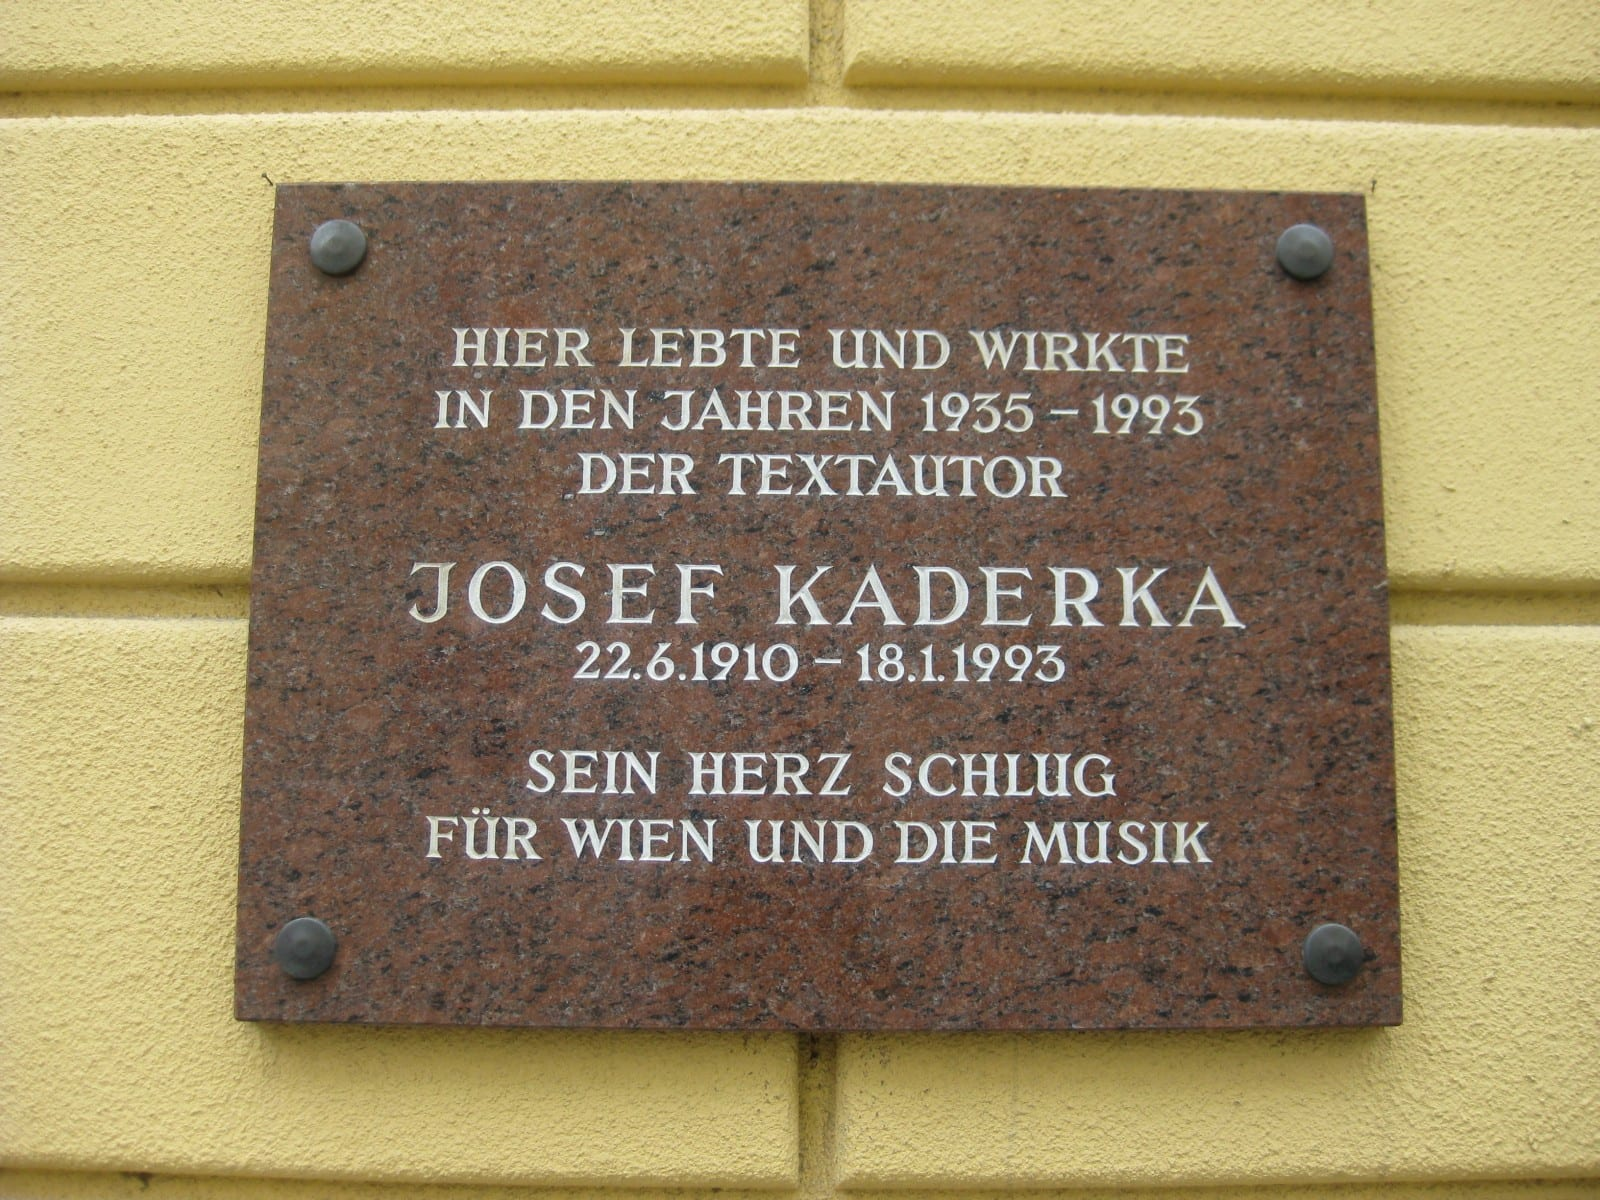 Josef Kaderka Gedenktafel